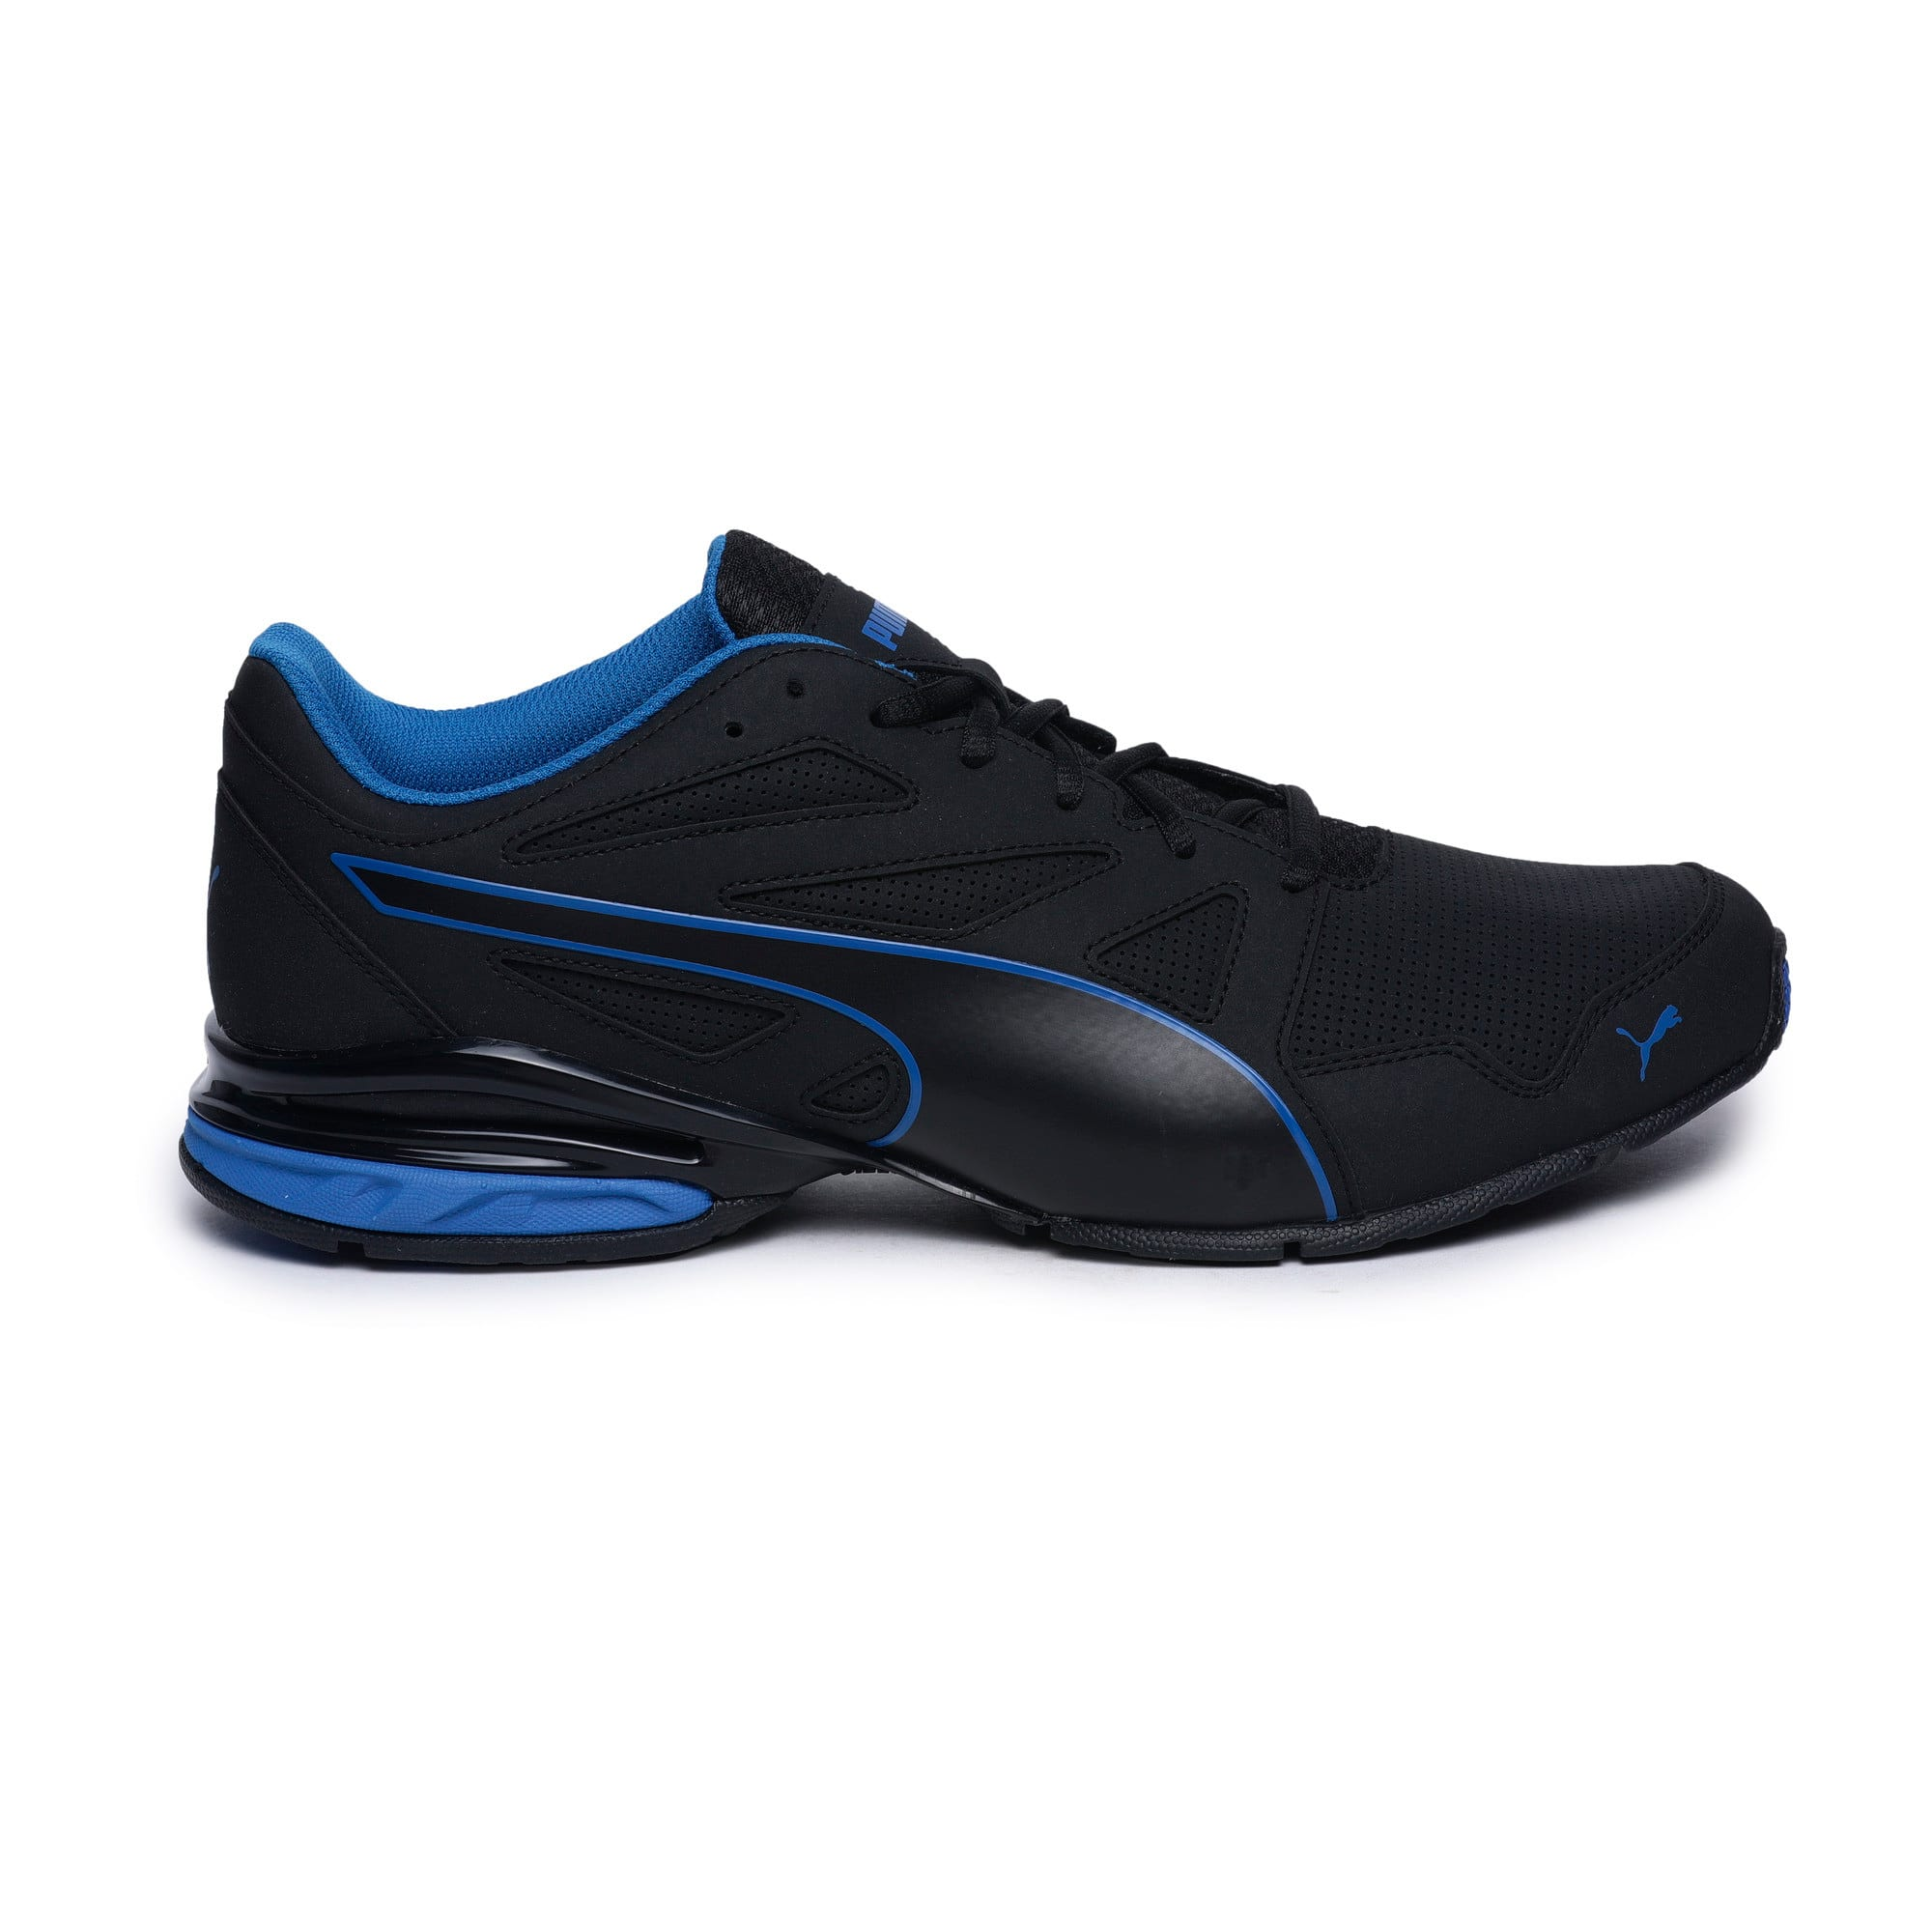 Thumbnail 5 of Tazon Modern SL Men's Running Shoes, Puma Black-Lapis Blue, medium-IND